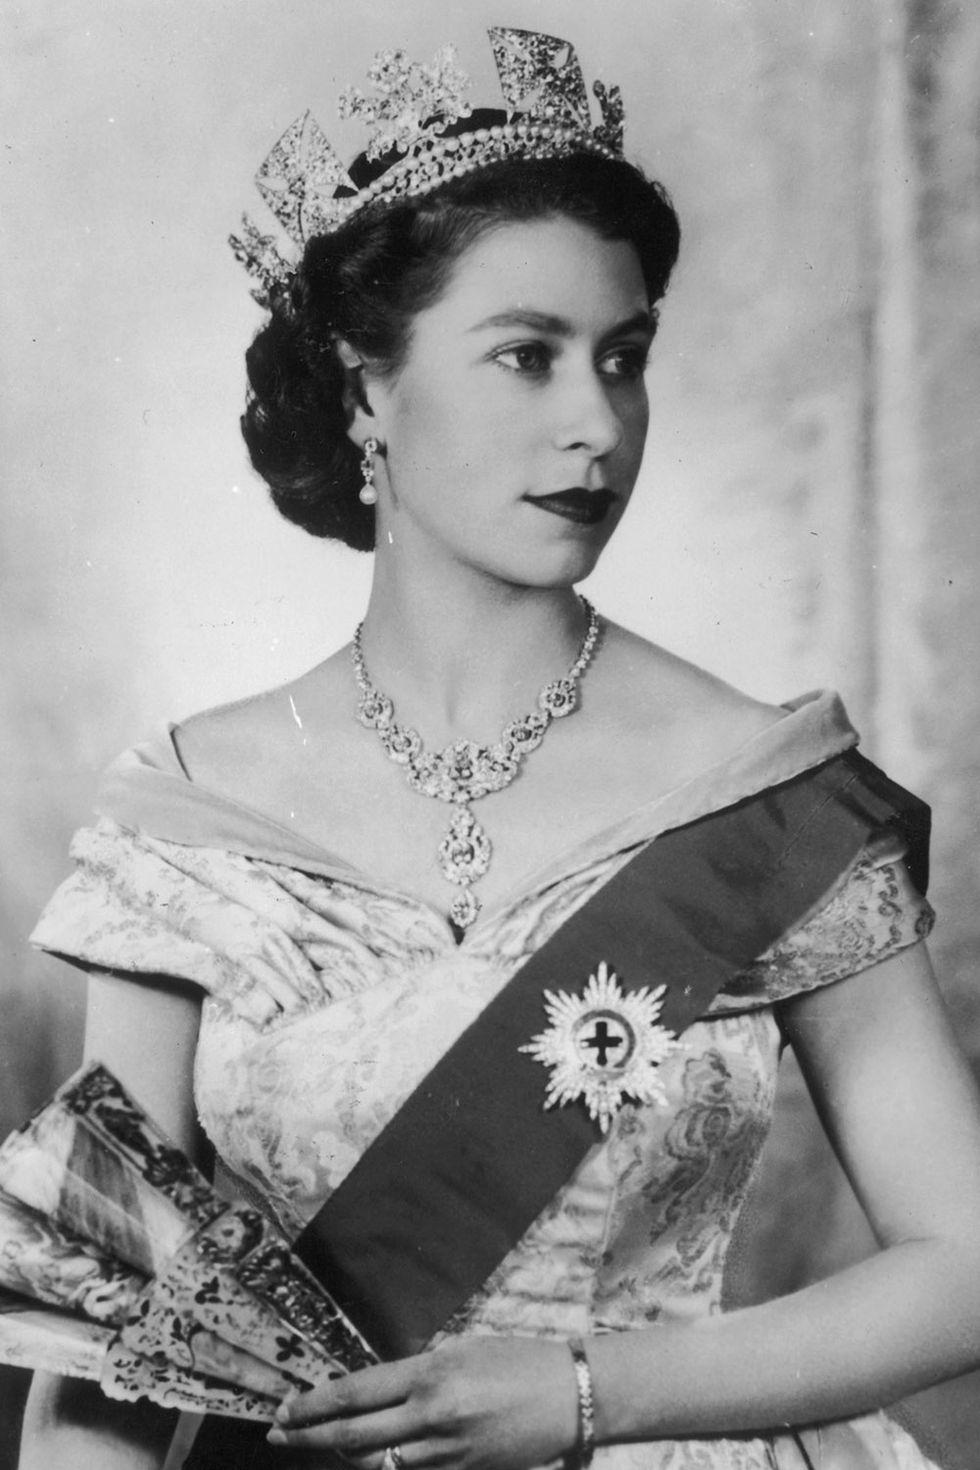 hbz-royal-hair-1955-queen-elizabeth-gettyimages-3229576-1500305800.jpg?crop=1xw:1xh;center,top&resize=980:*